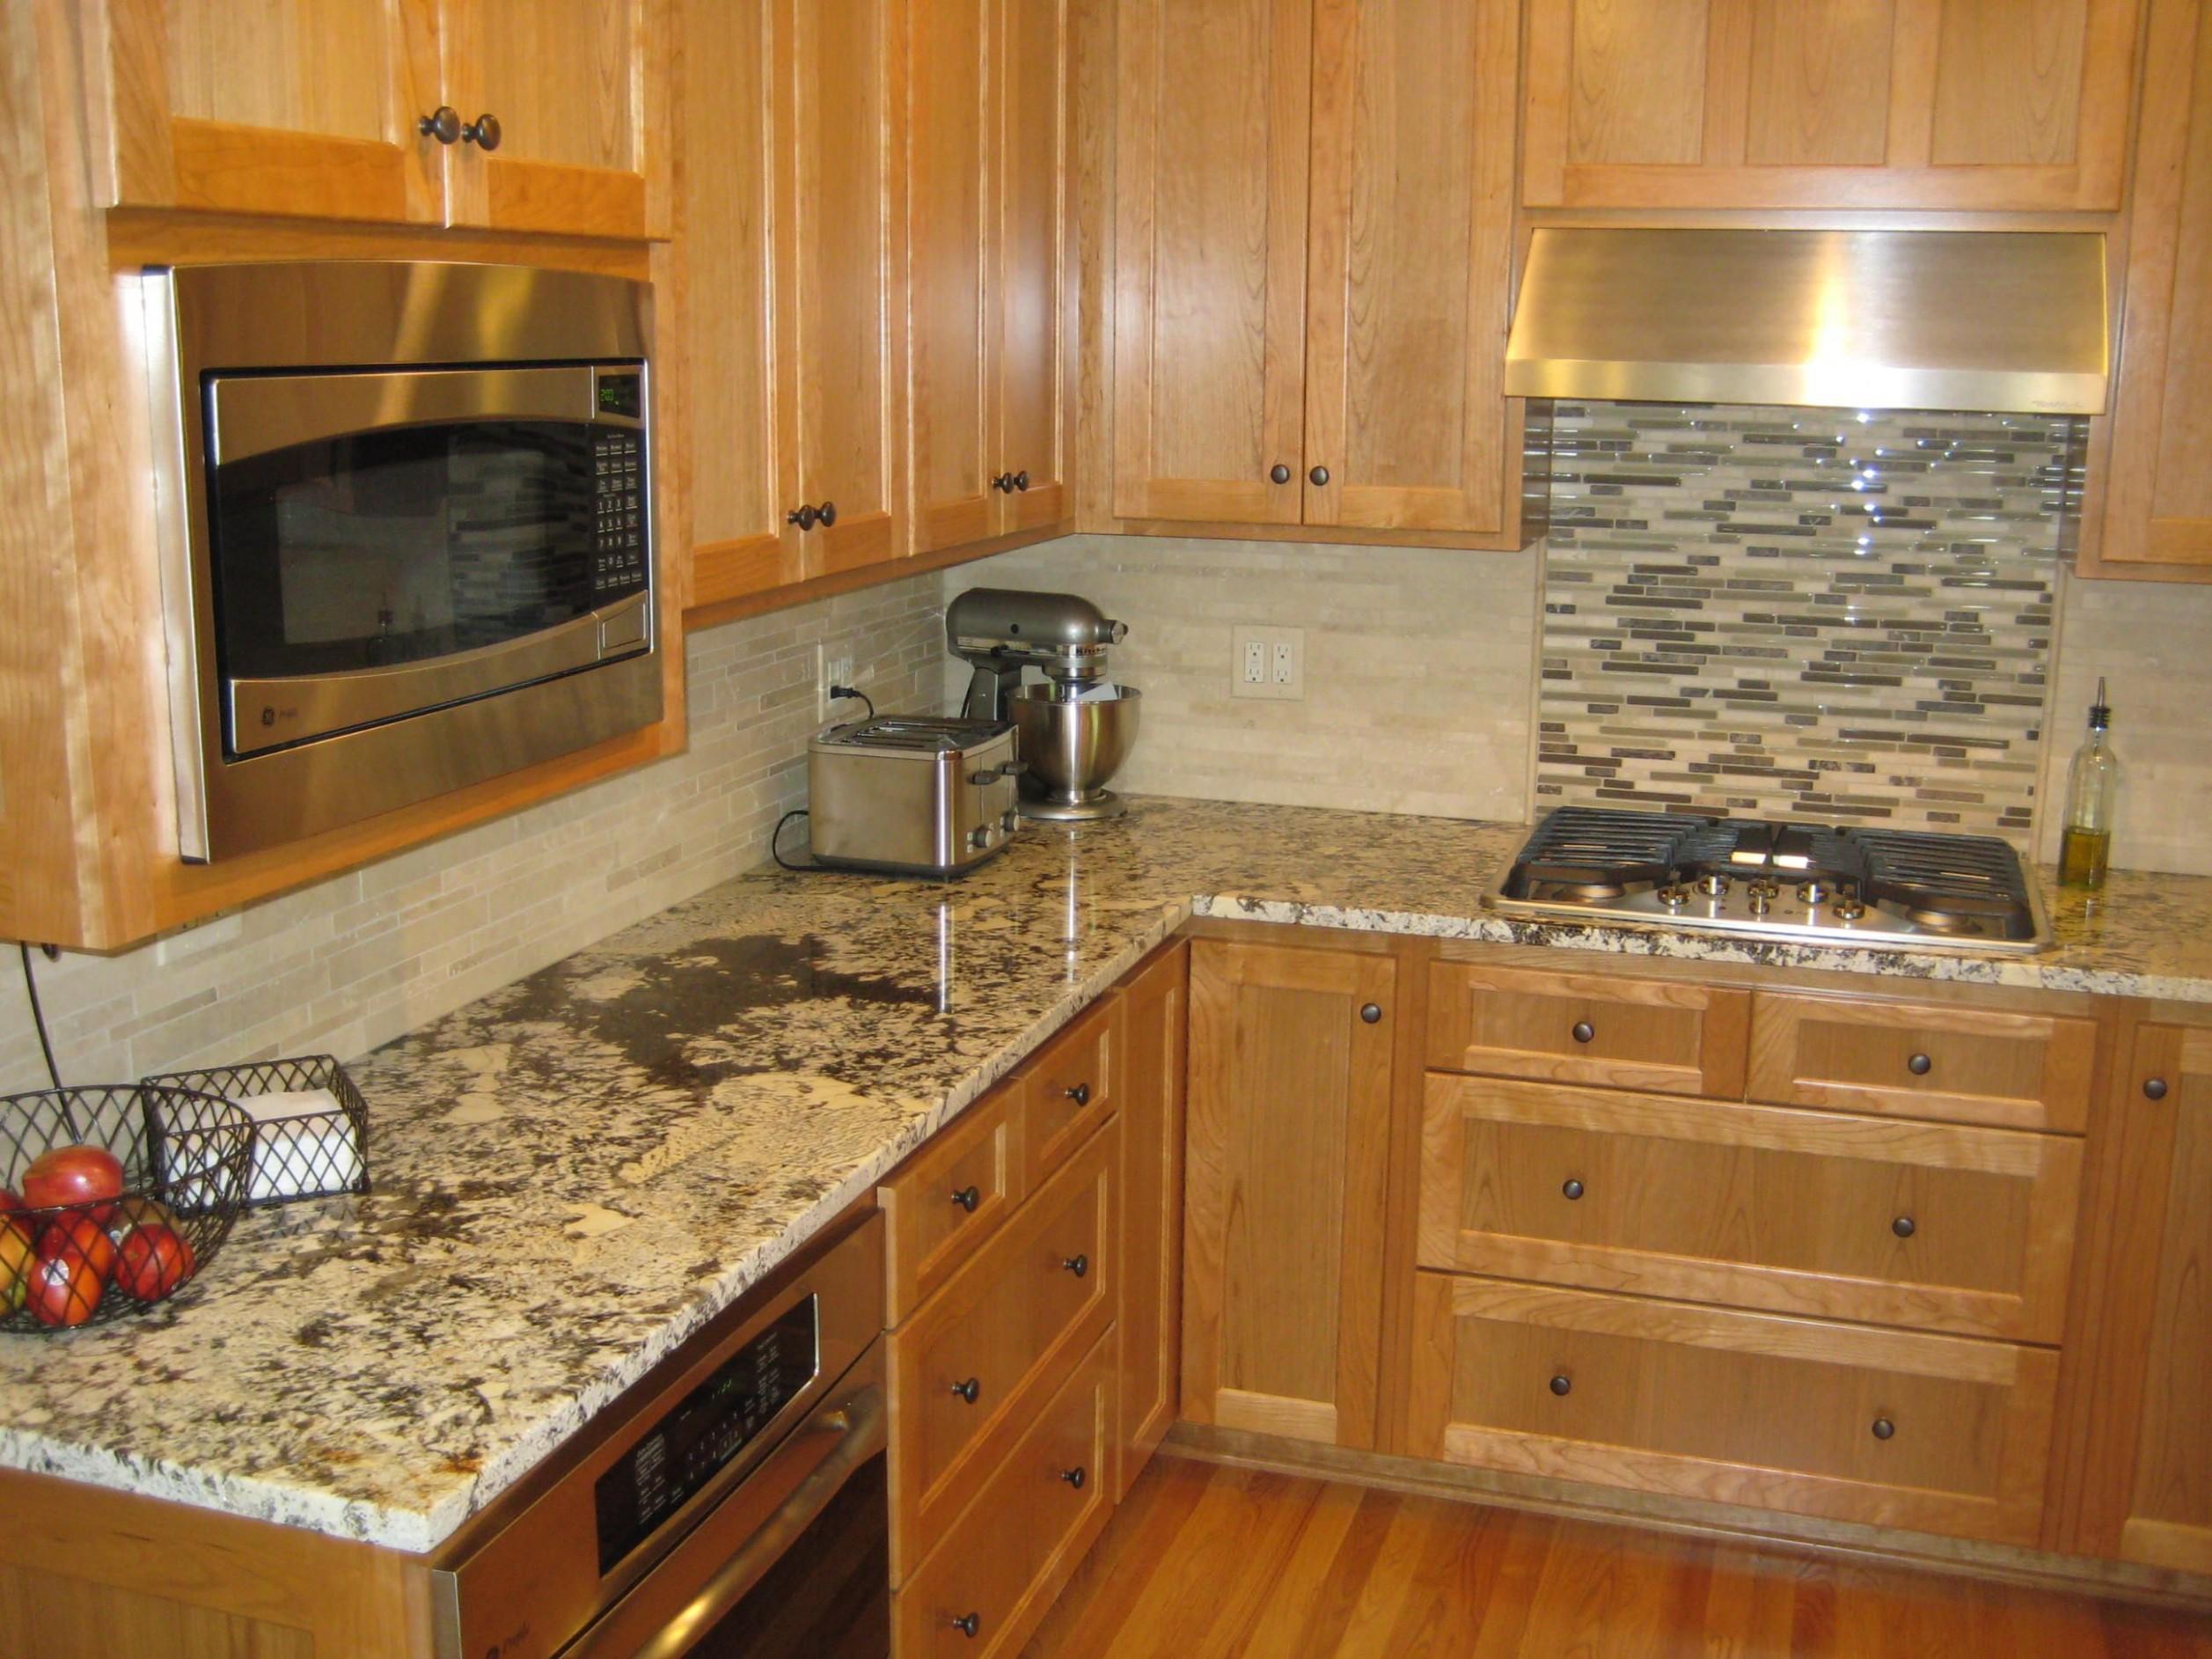 Bianco Antico granite - like backsplash but not stove accent wall  - Kitchen Backsplash With Light Wood Cabinets